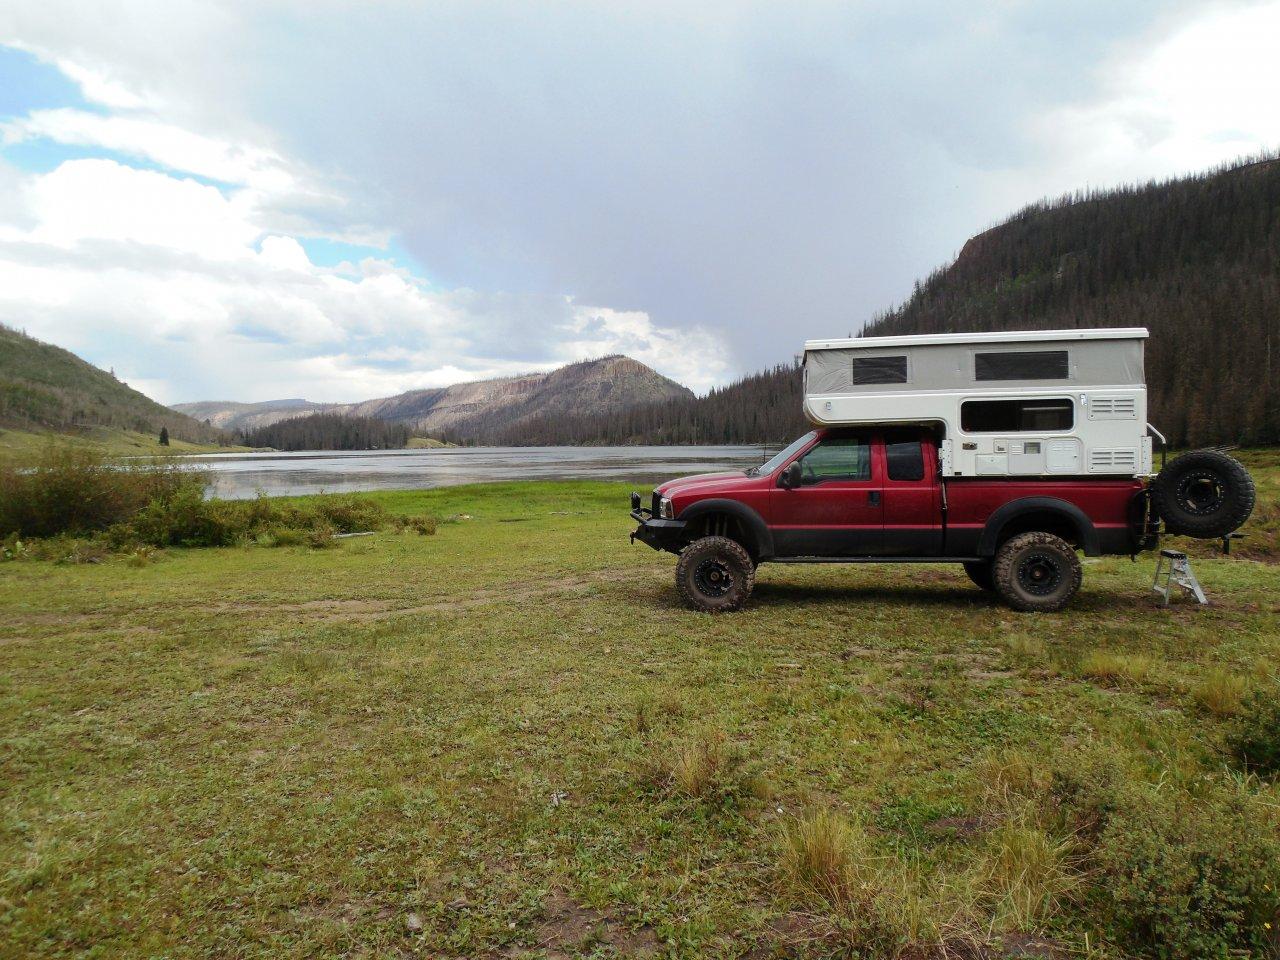 20140810_X_Regan Lake Camp.jpg